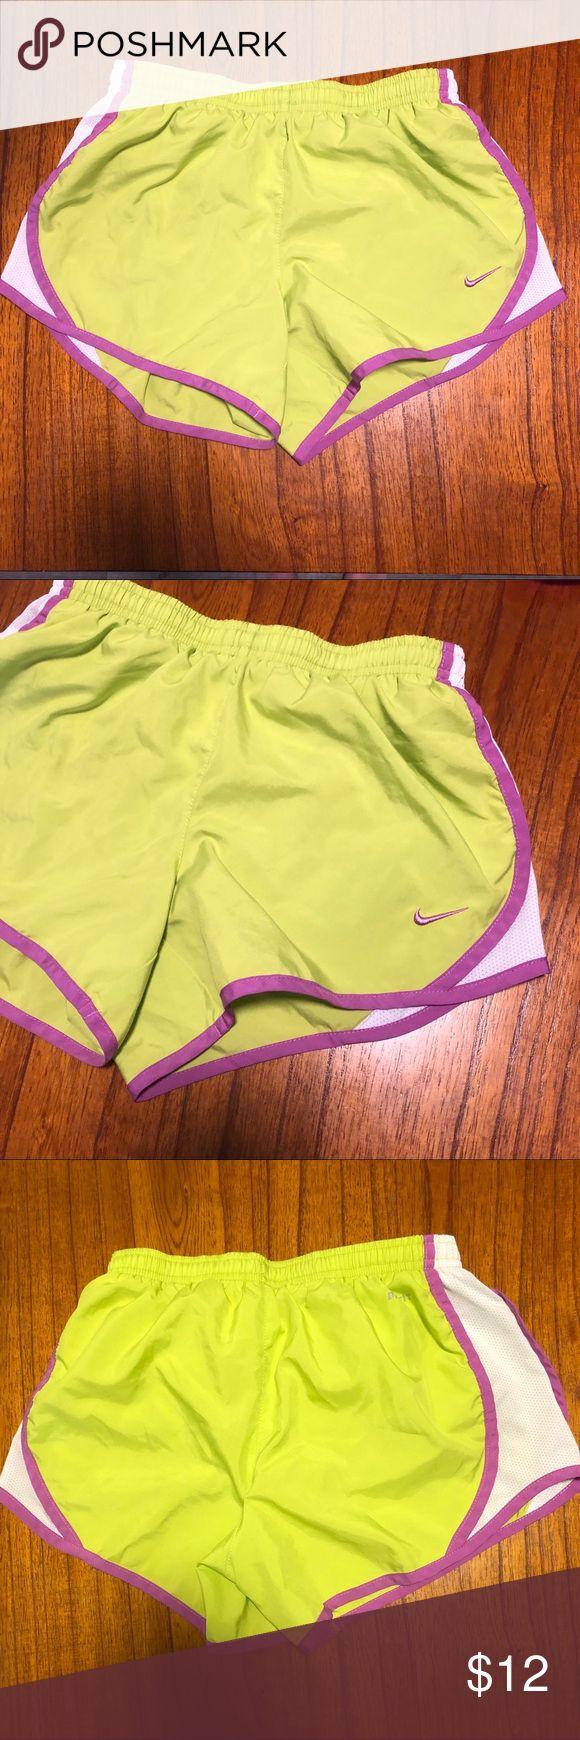 Nike Shorts Girls Medium Nike Shorts. Drawstring waist and built in underwear   …